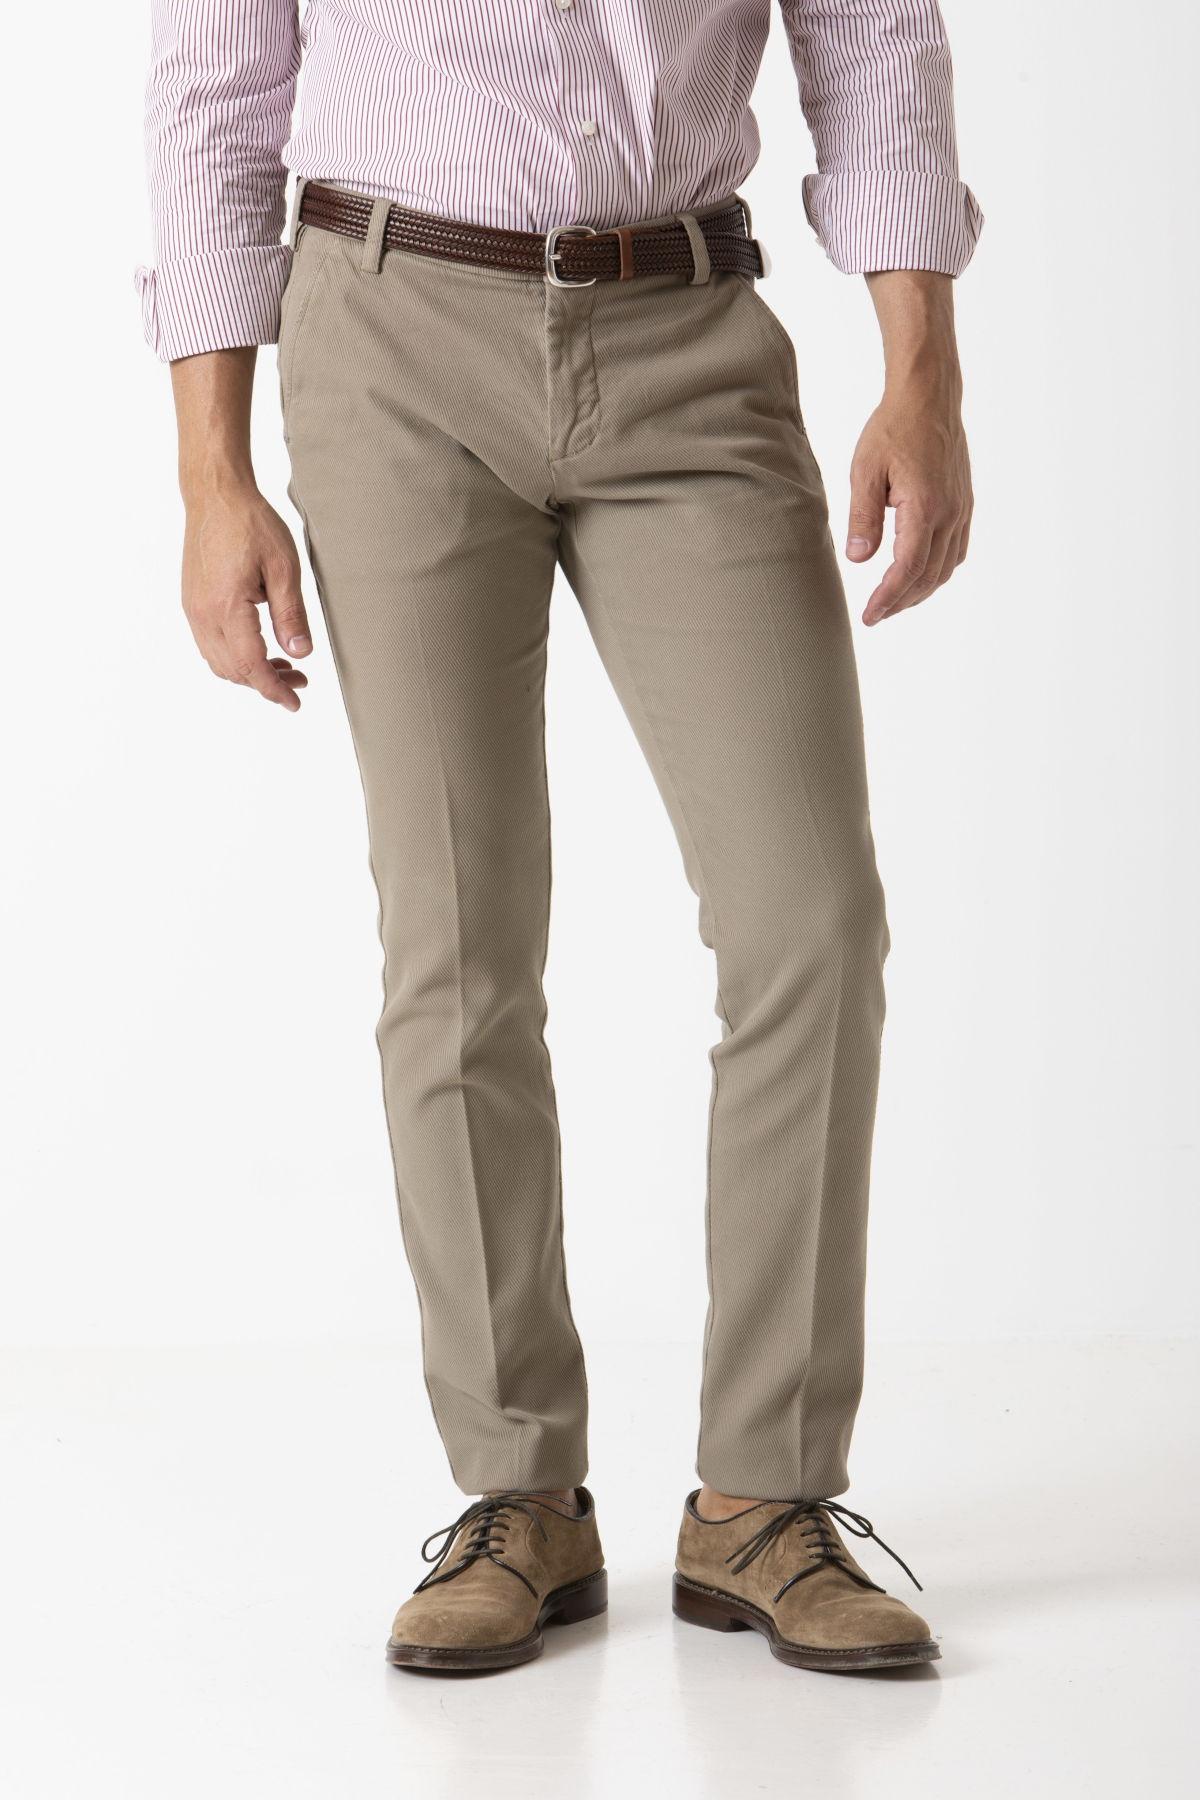 Pantaloni per uomo ENTRE AMIS A/I 19-20